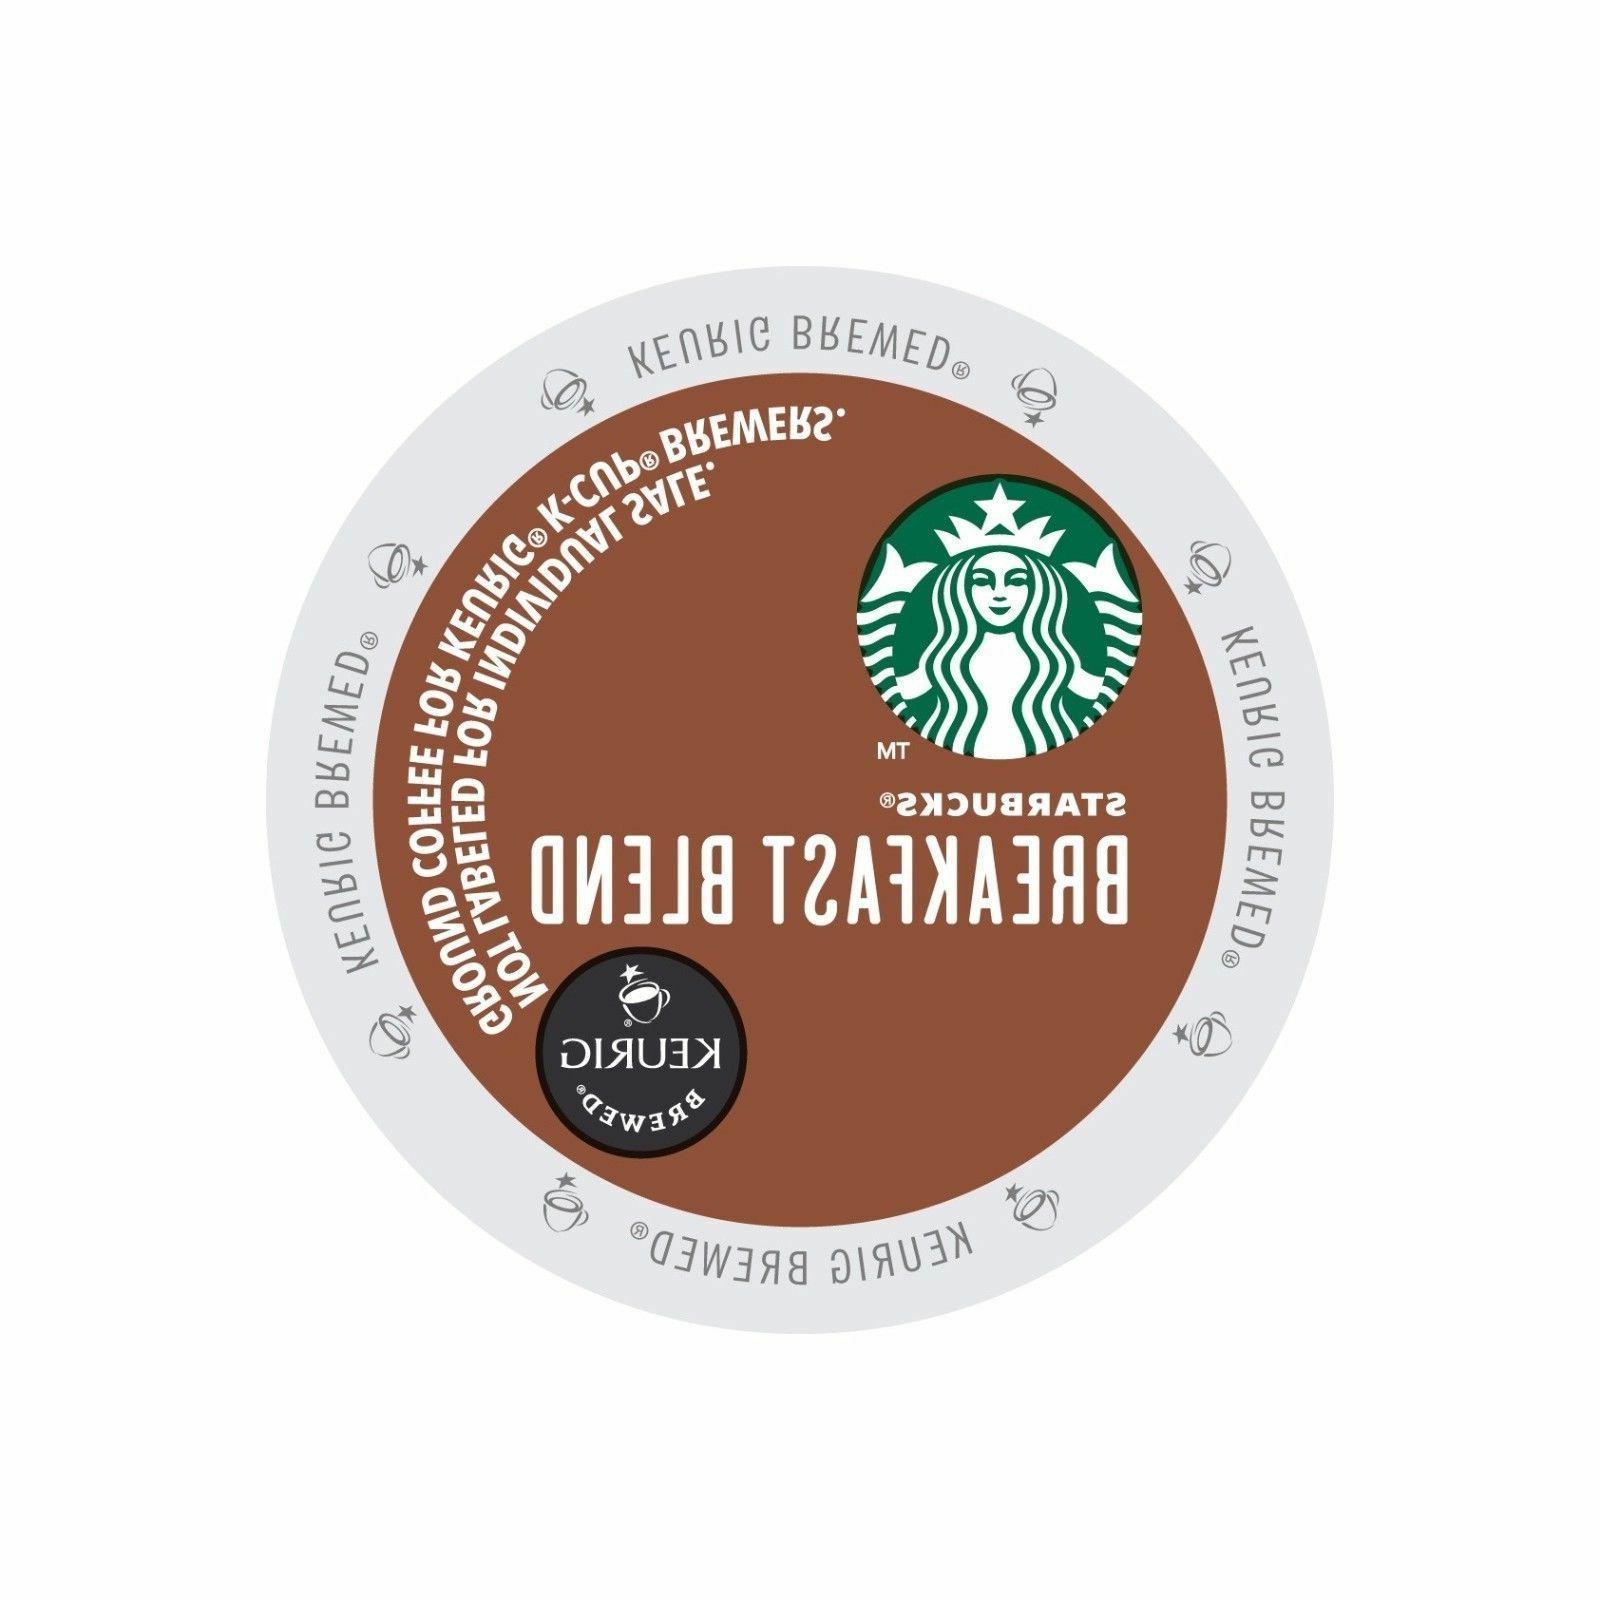 Starbucks PICK FLAVOR FREE EXPEDITED